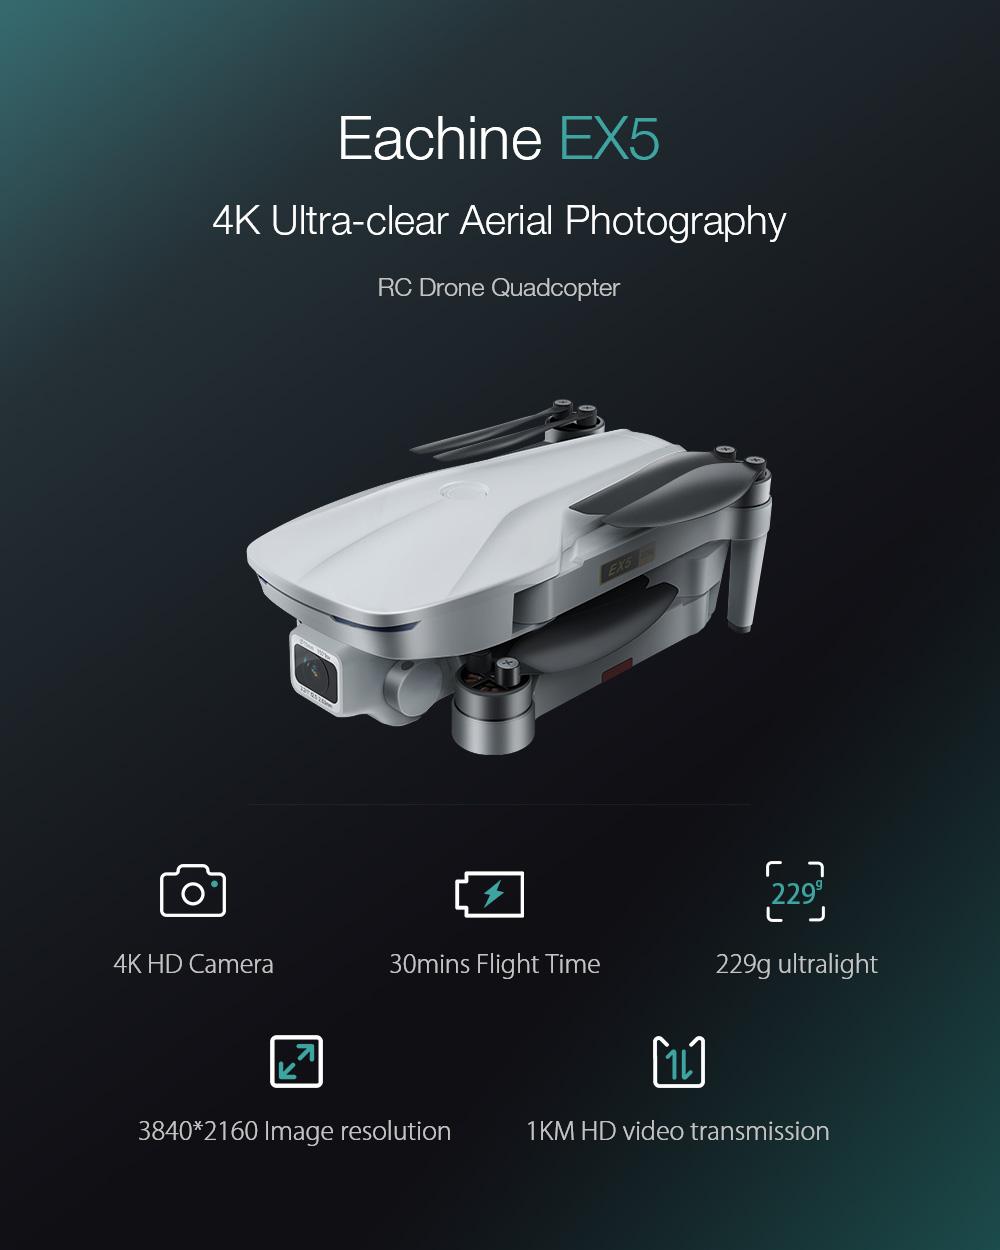 Eachine EX5 5G WIFI 1KM FPV GPS With 4K HD Camera 30mins Flight Time Optical Flow 229g Foldable RC Drone Quadcopter RTF